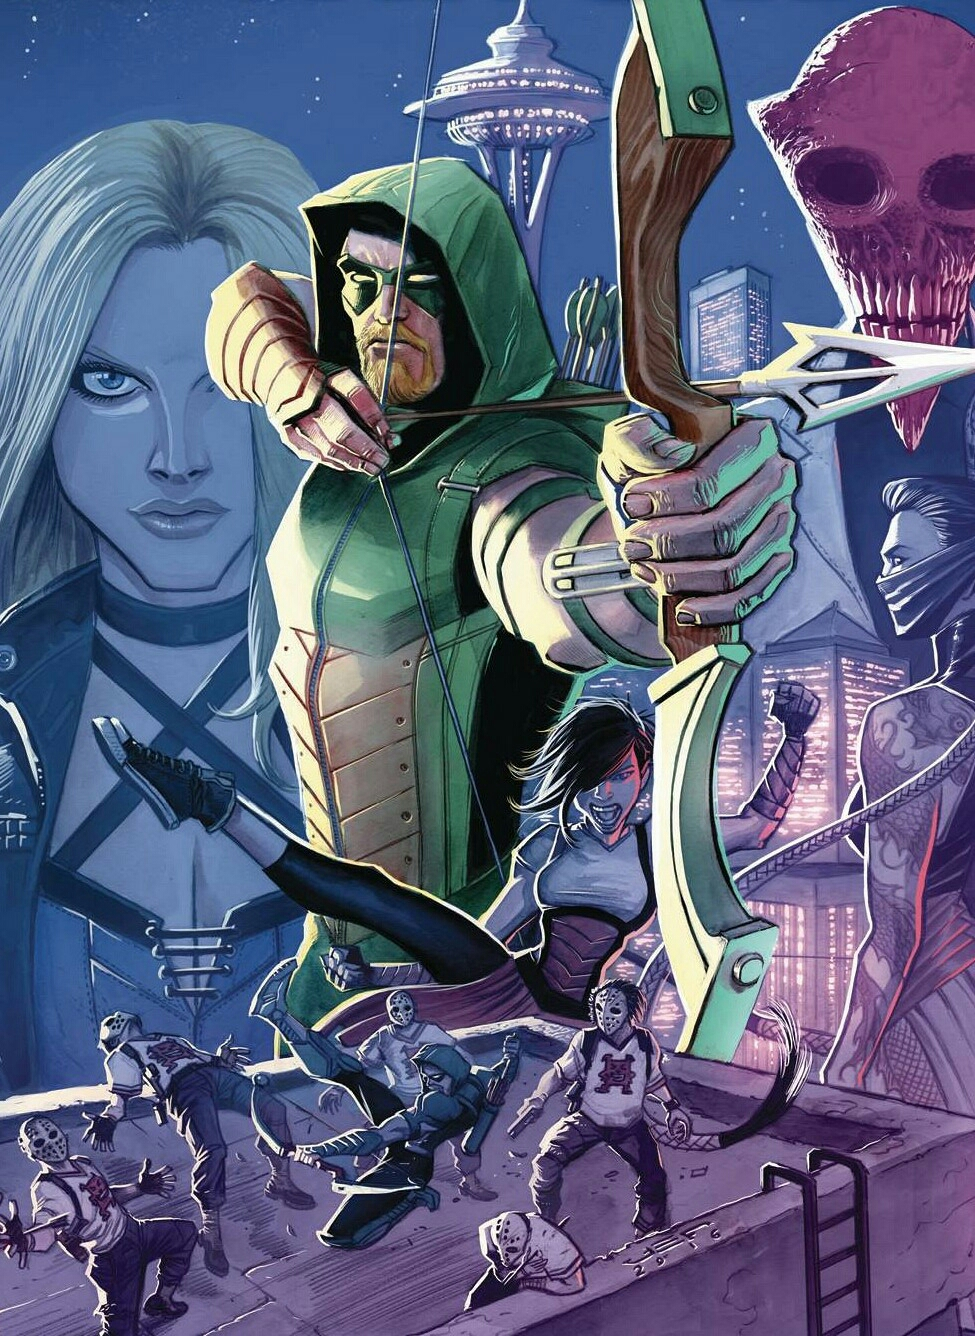 Green Arrow #1 cover art